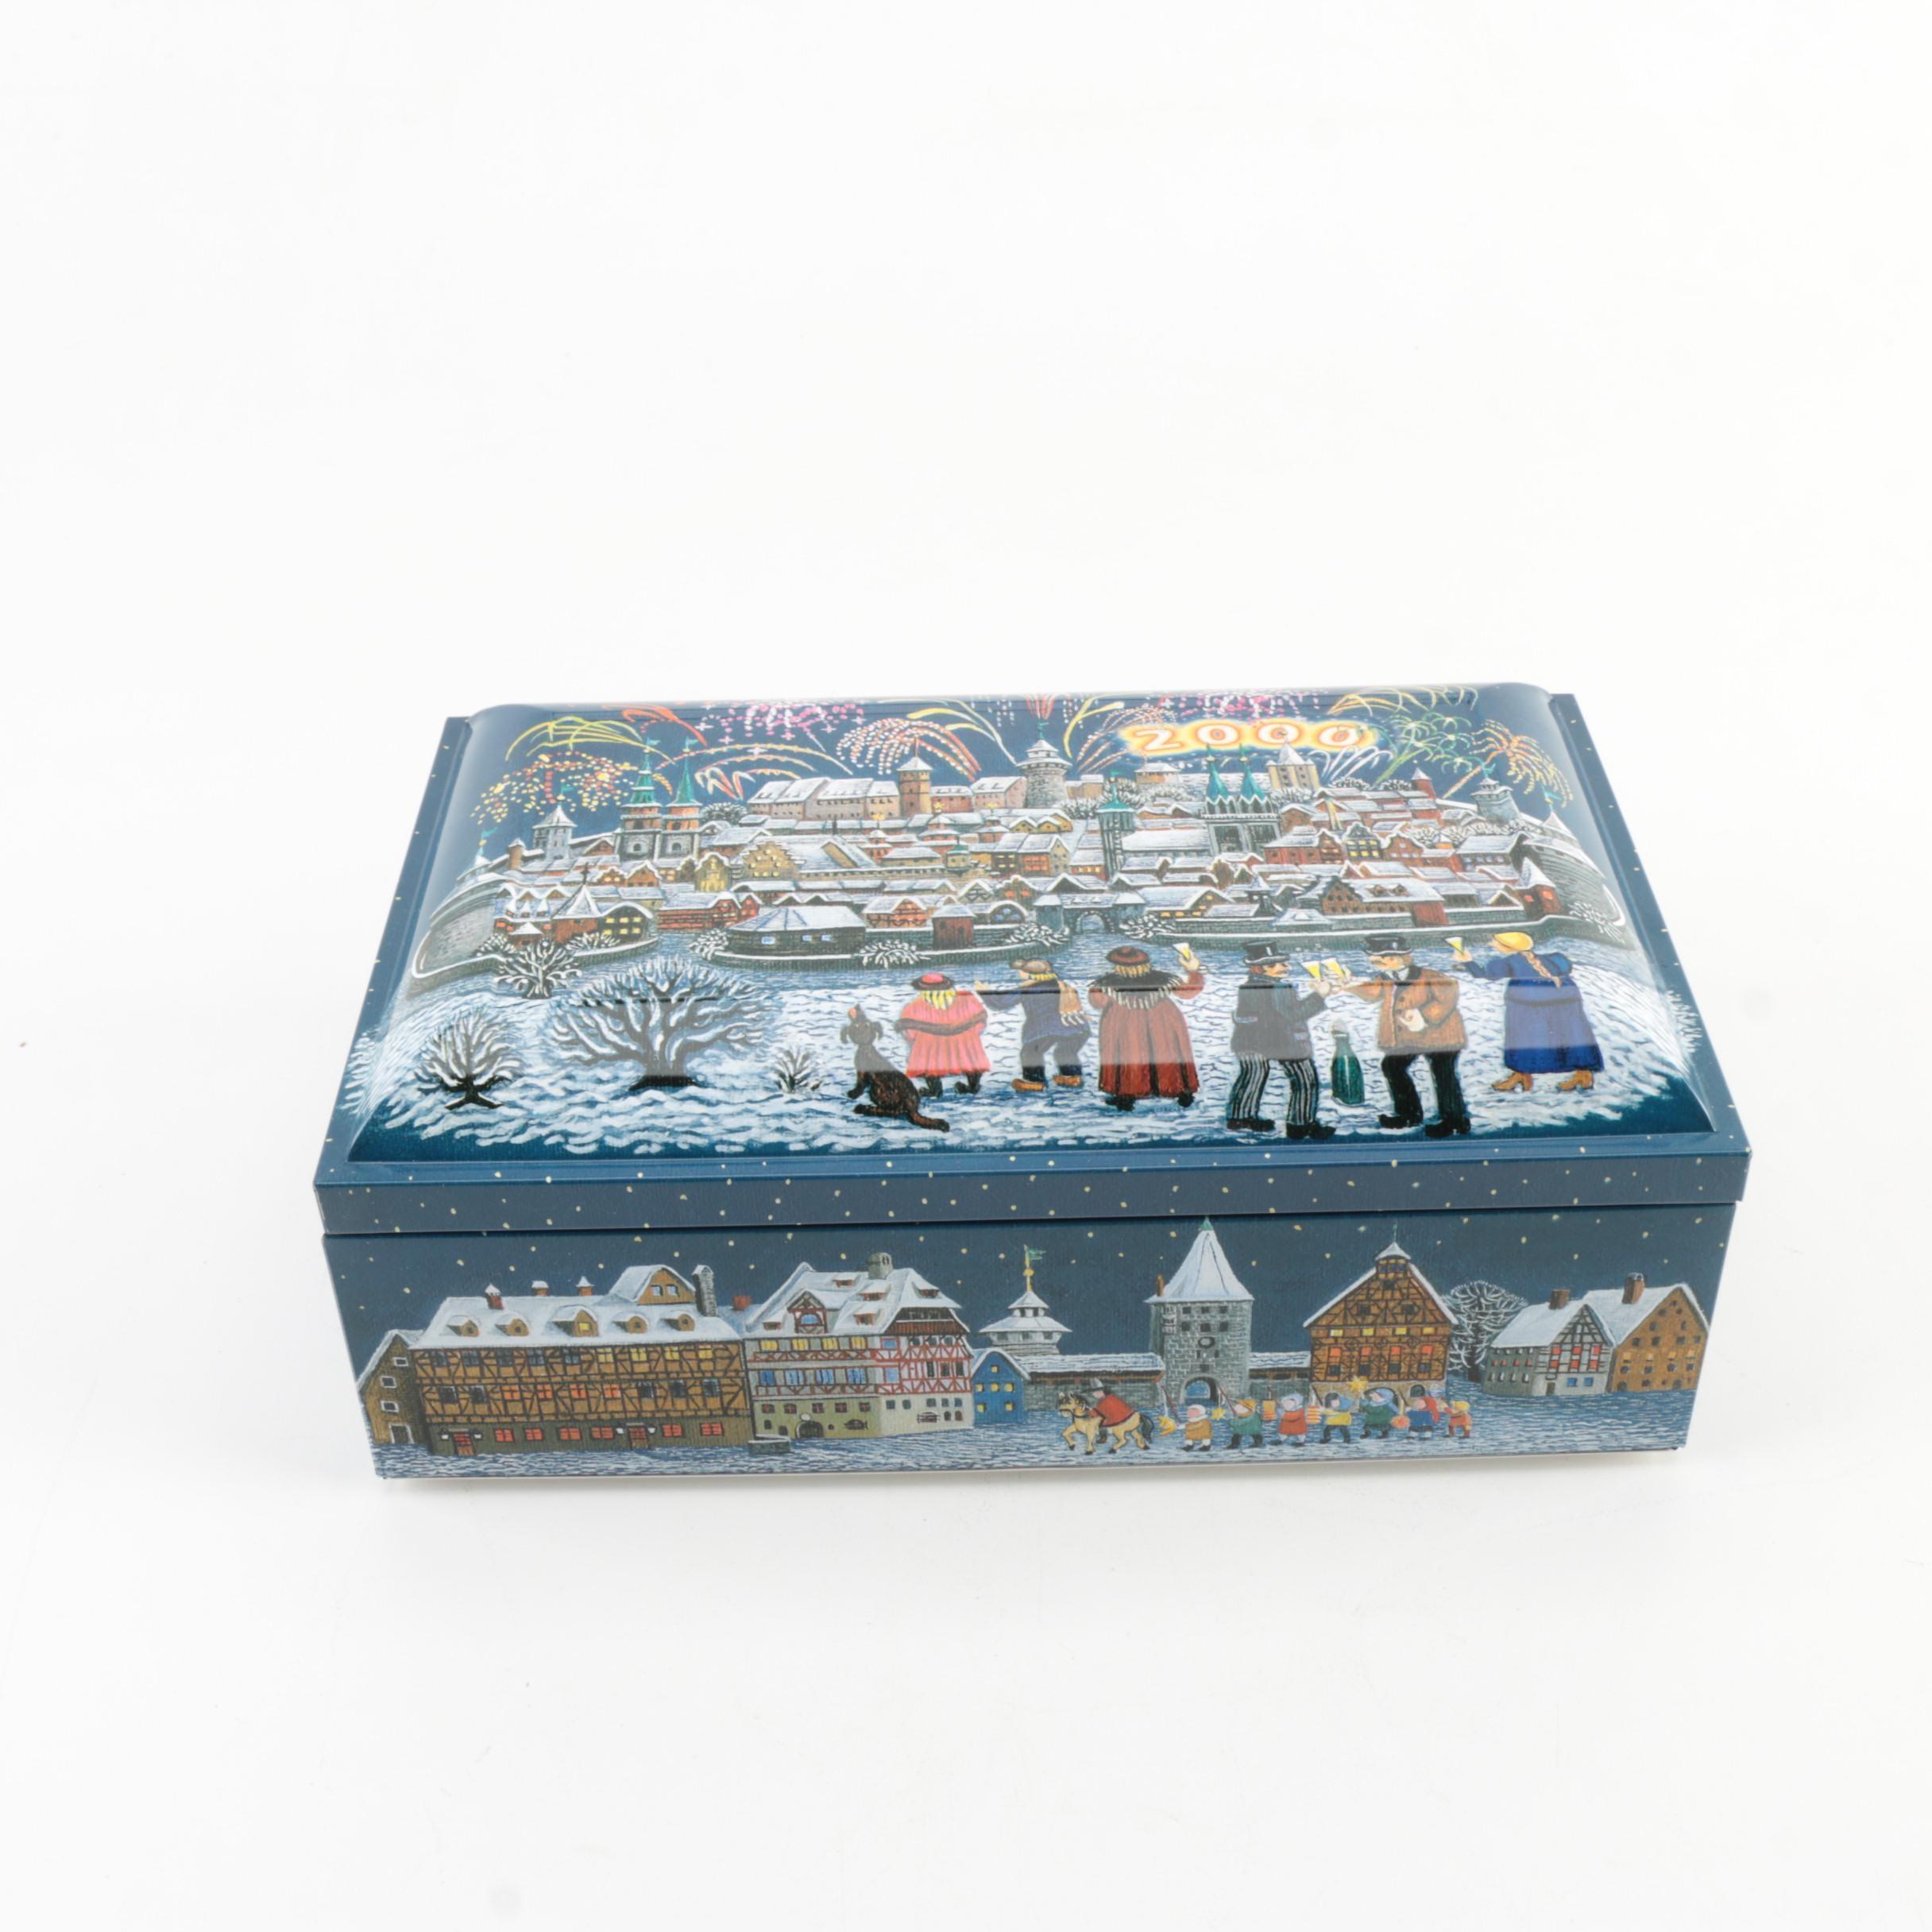 Lebkuchen Schmidt Holiday Tin Box